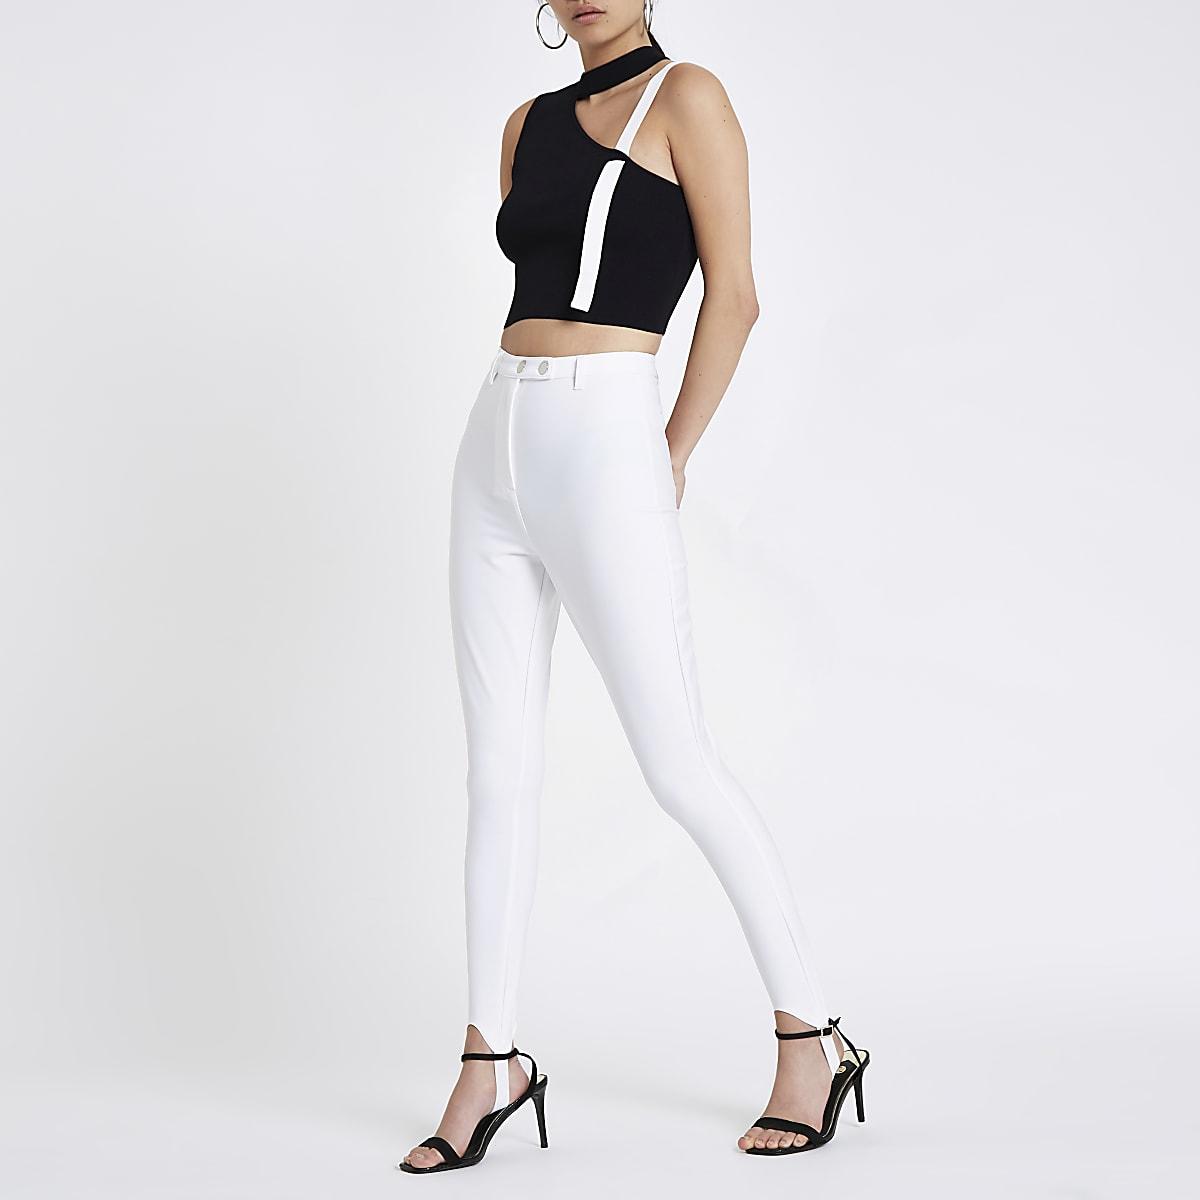 White high waisted stirrup leggings